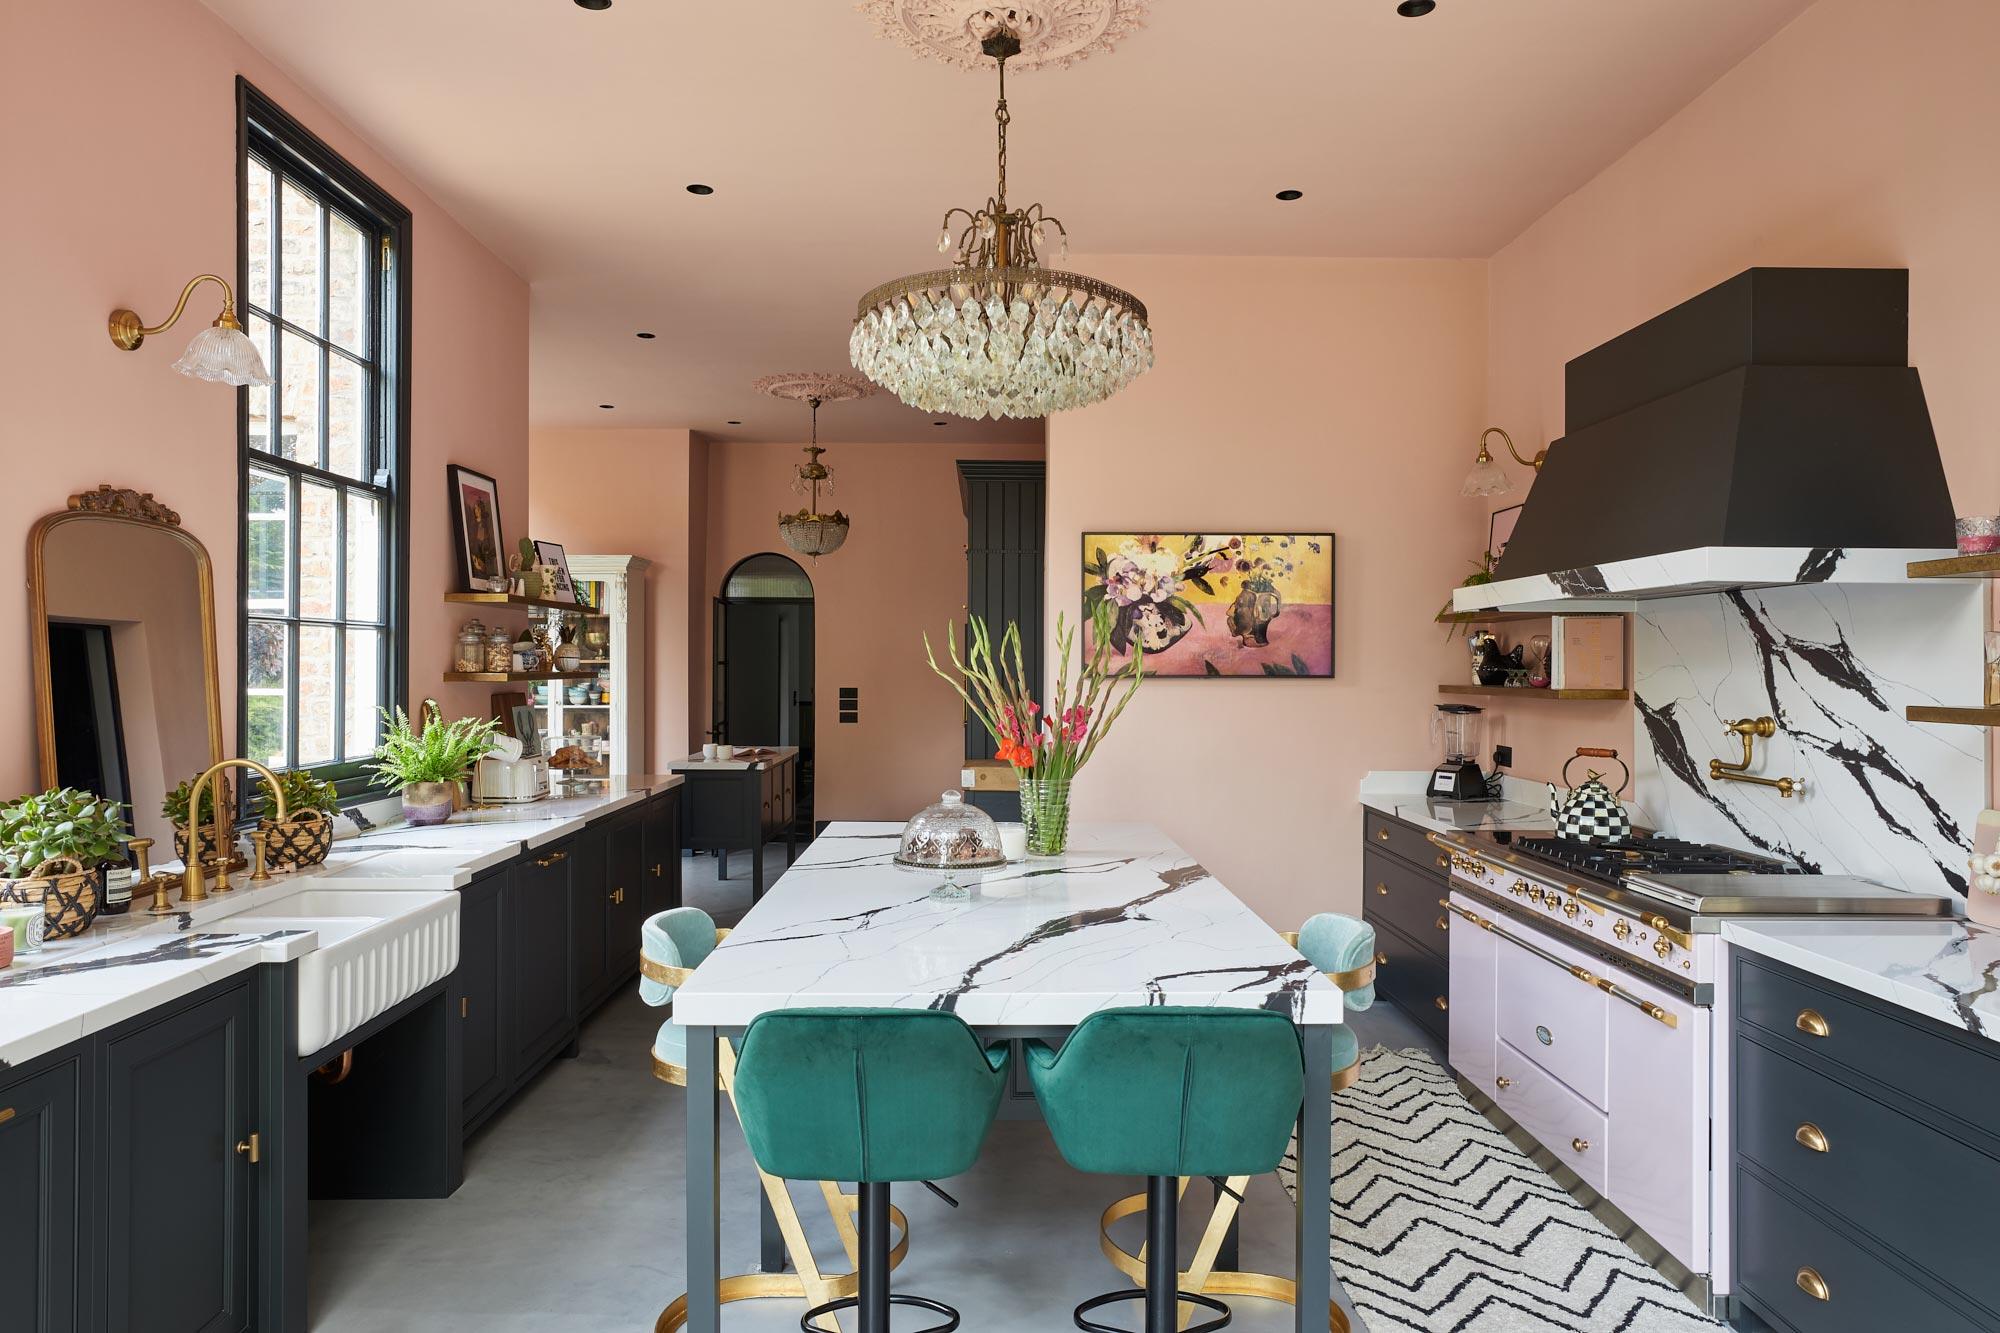 Shaker blue and pink kitchen design